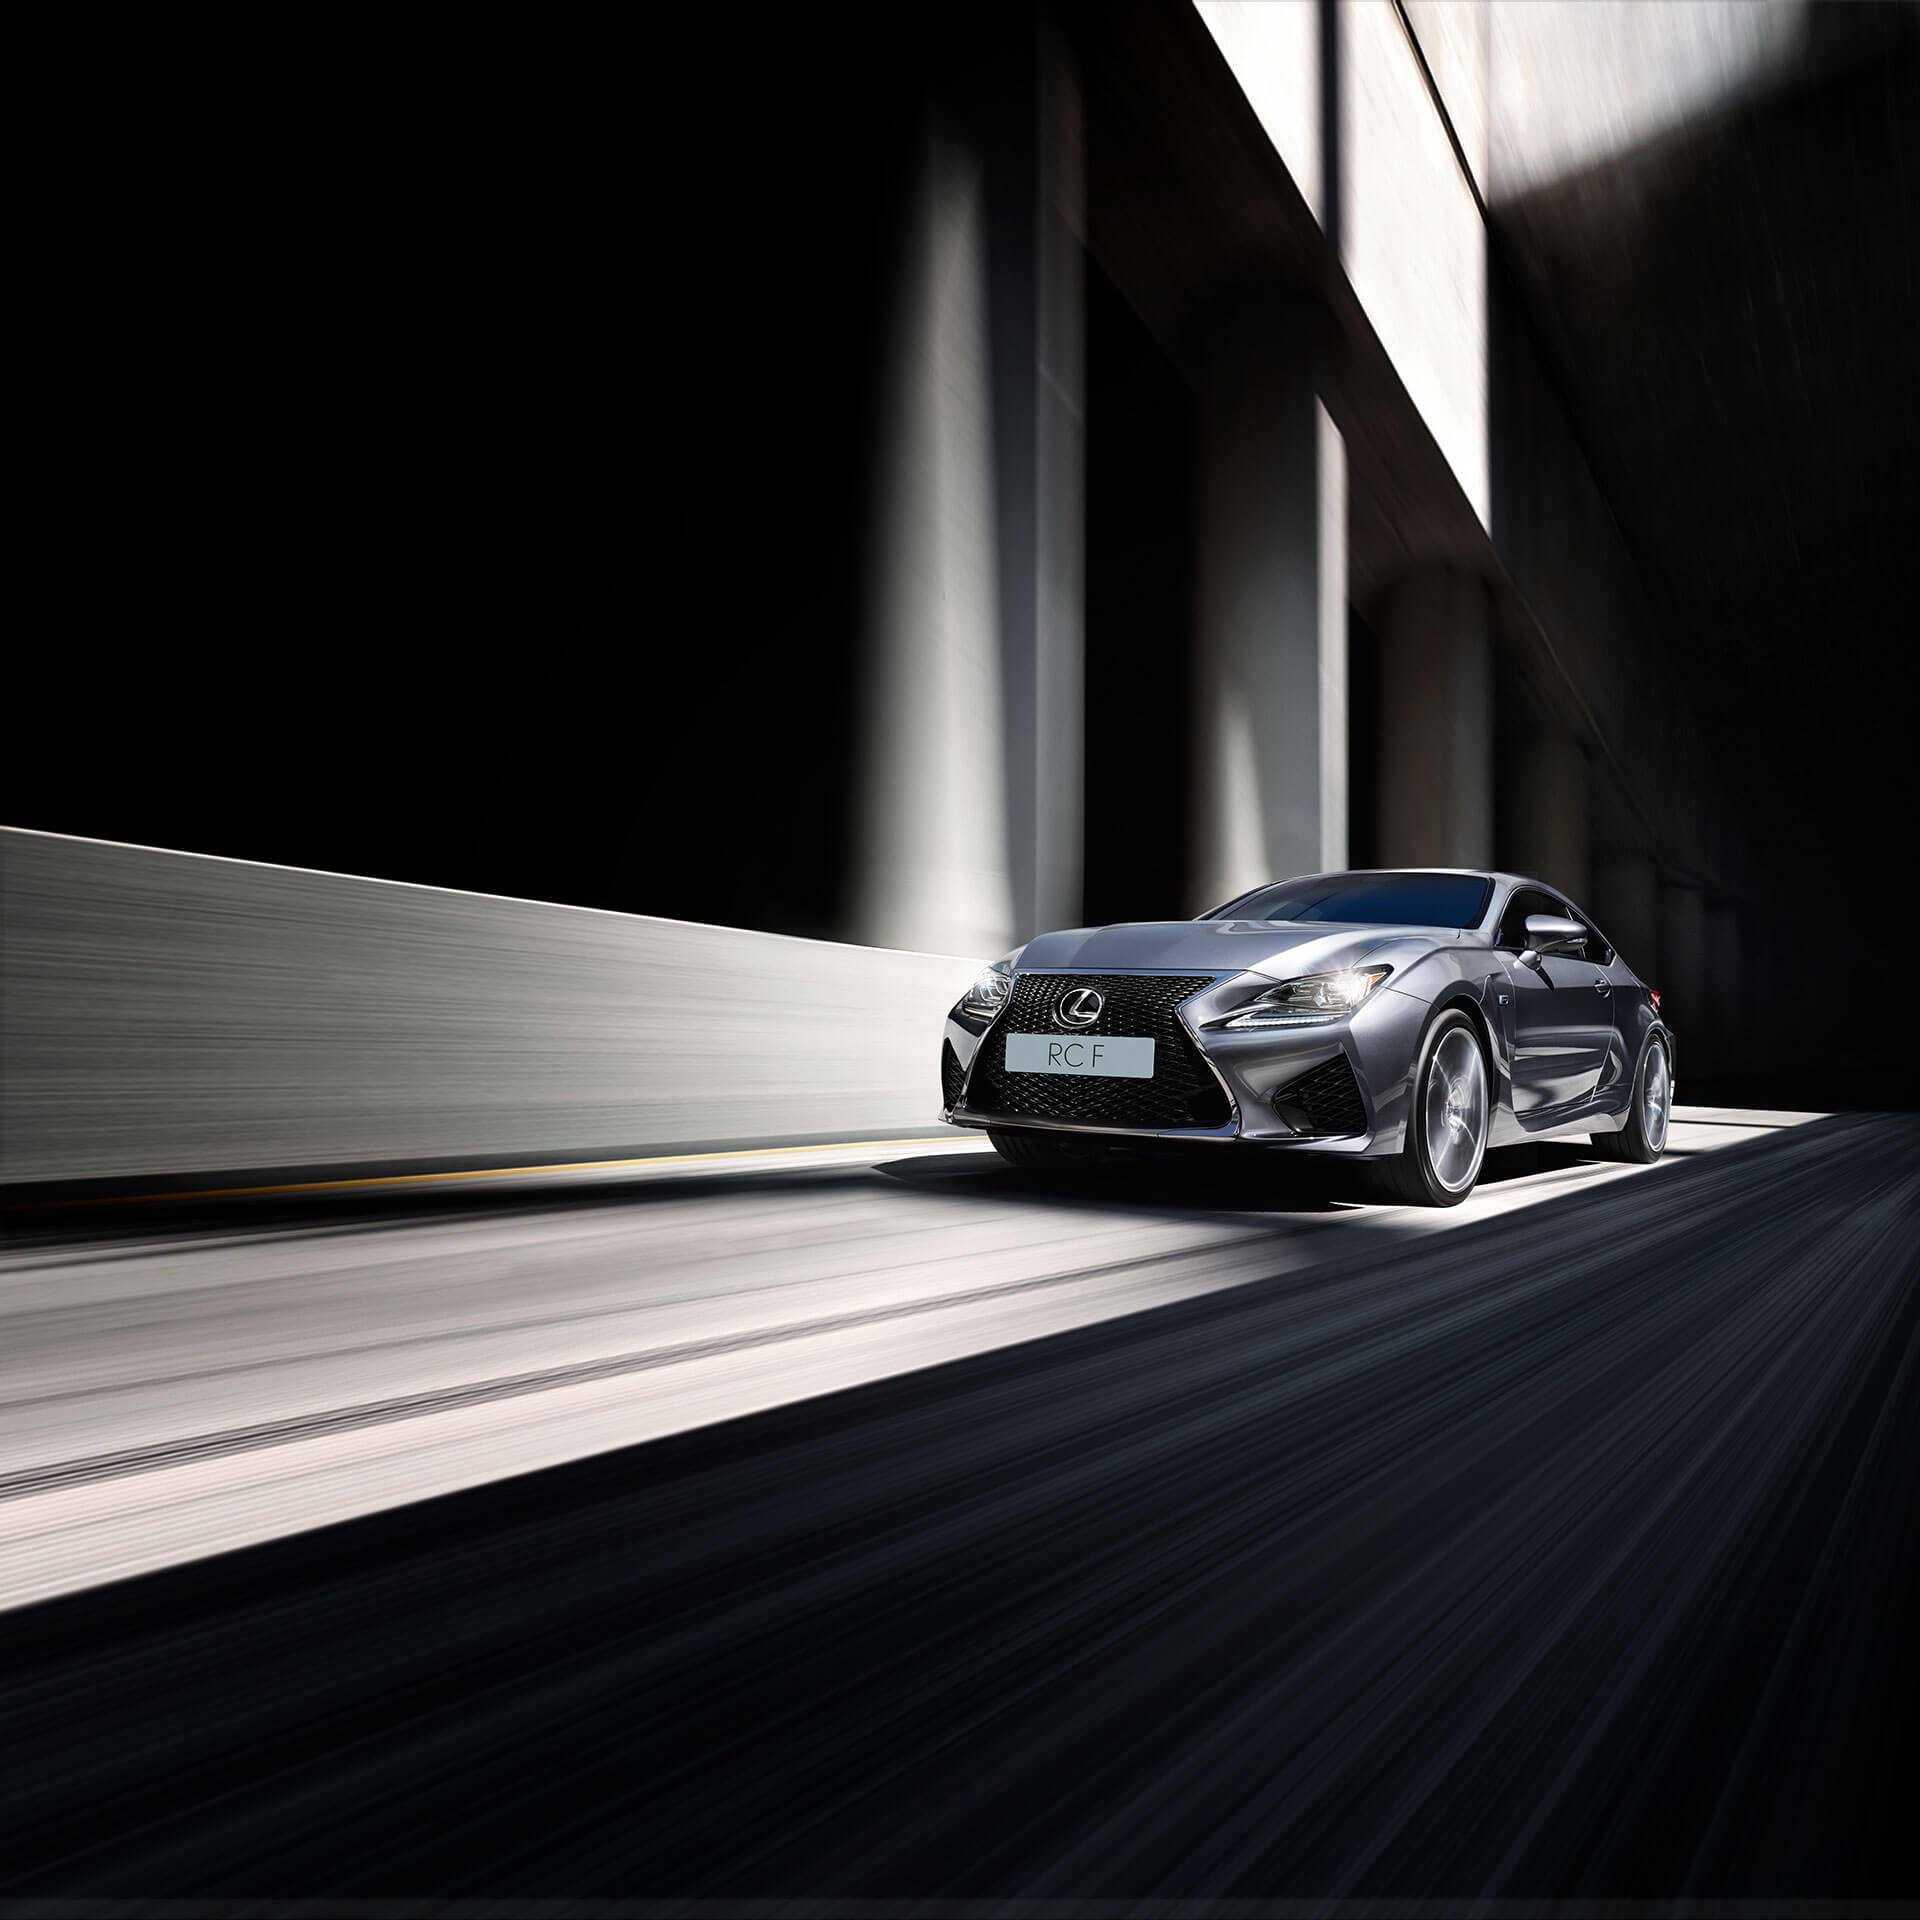 Lexus Performance F Modelleri